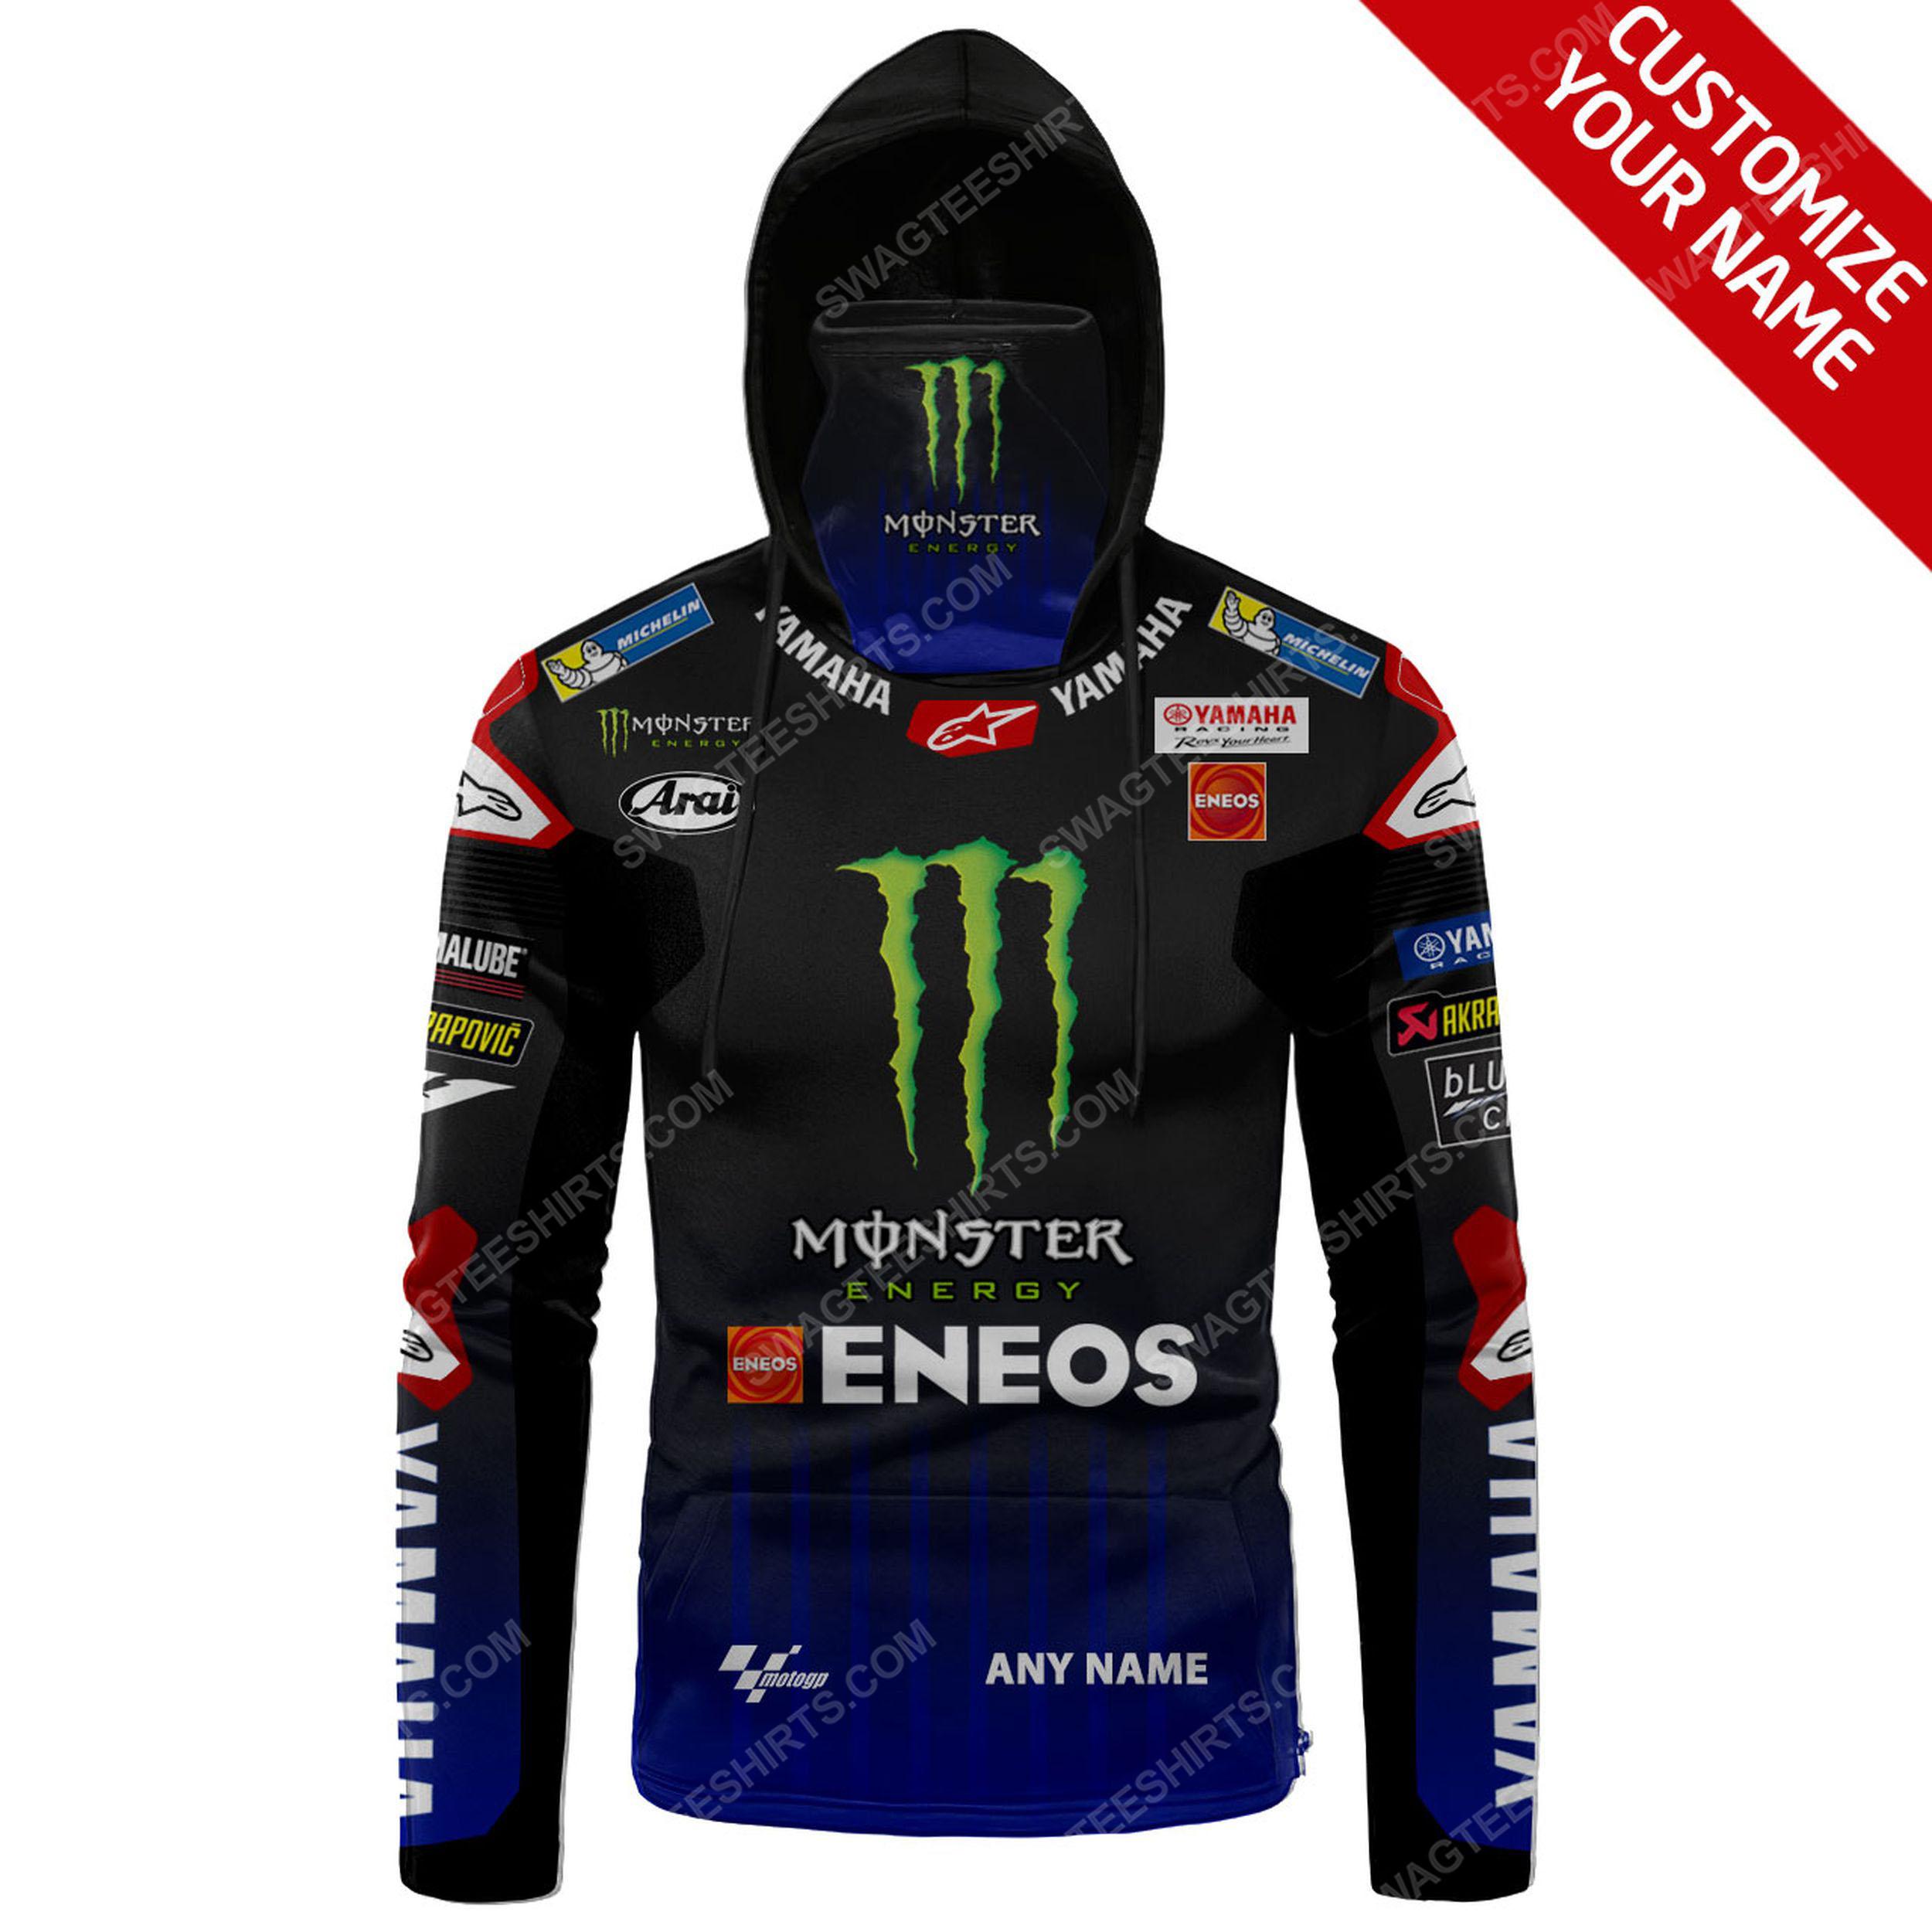 Custom name monster energy yamaha racing full print mask hoodie 2(1) - Copy